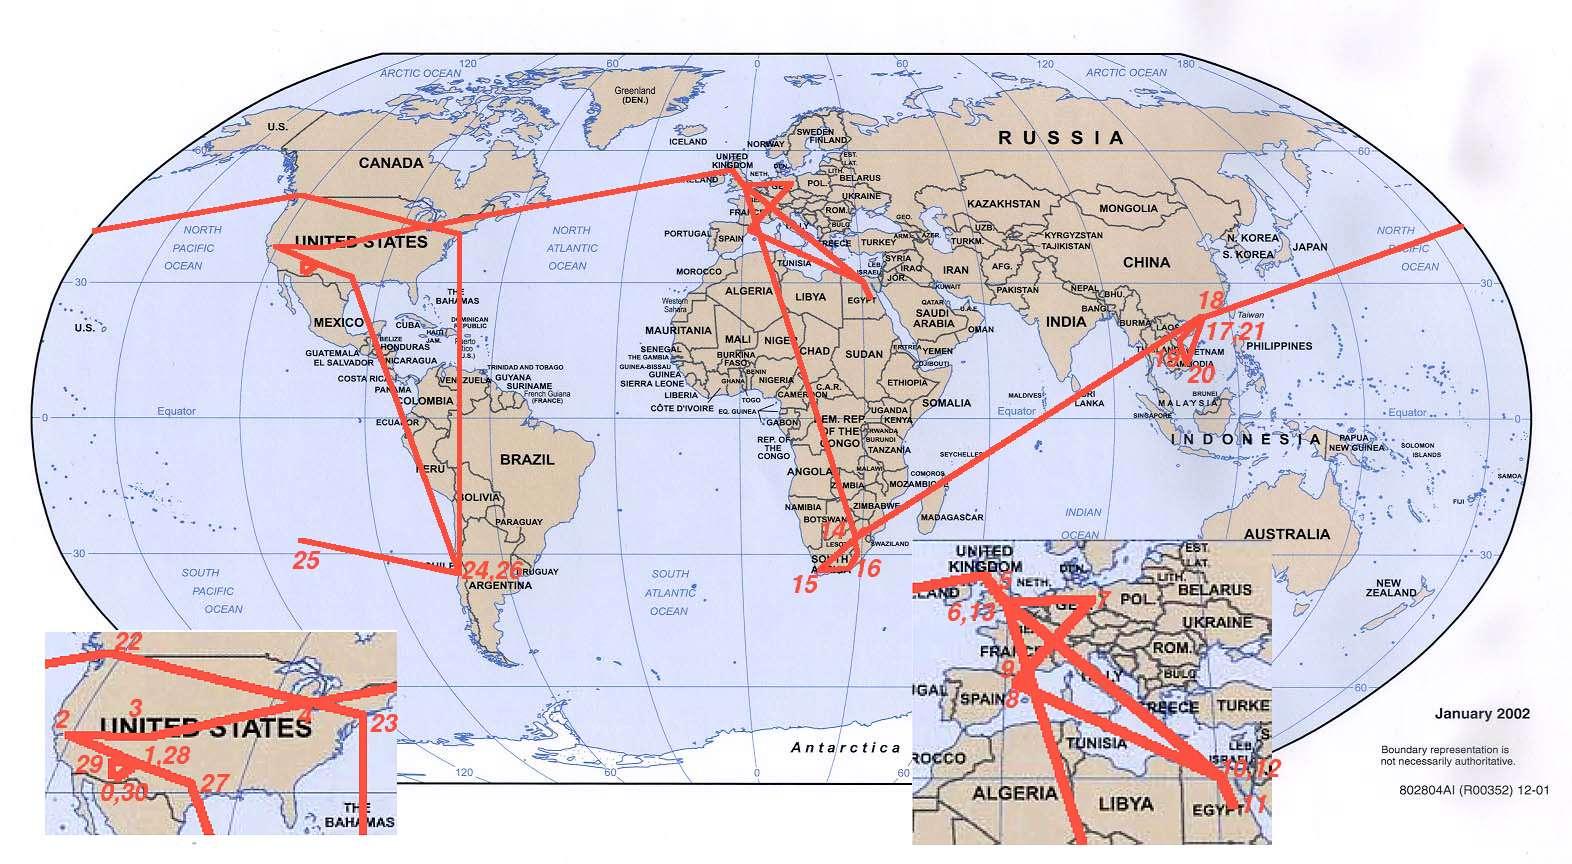 Jerry Peeks Photos Around the World 2003 – Map My Trip